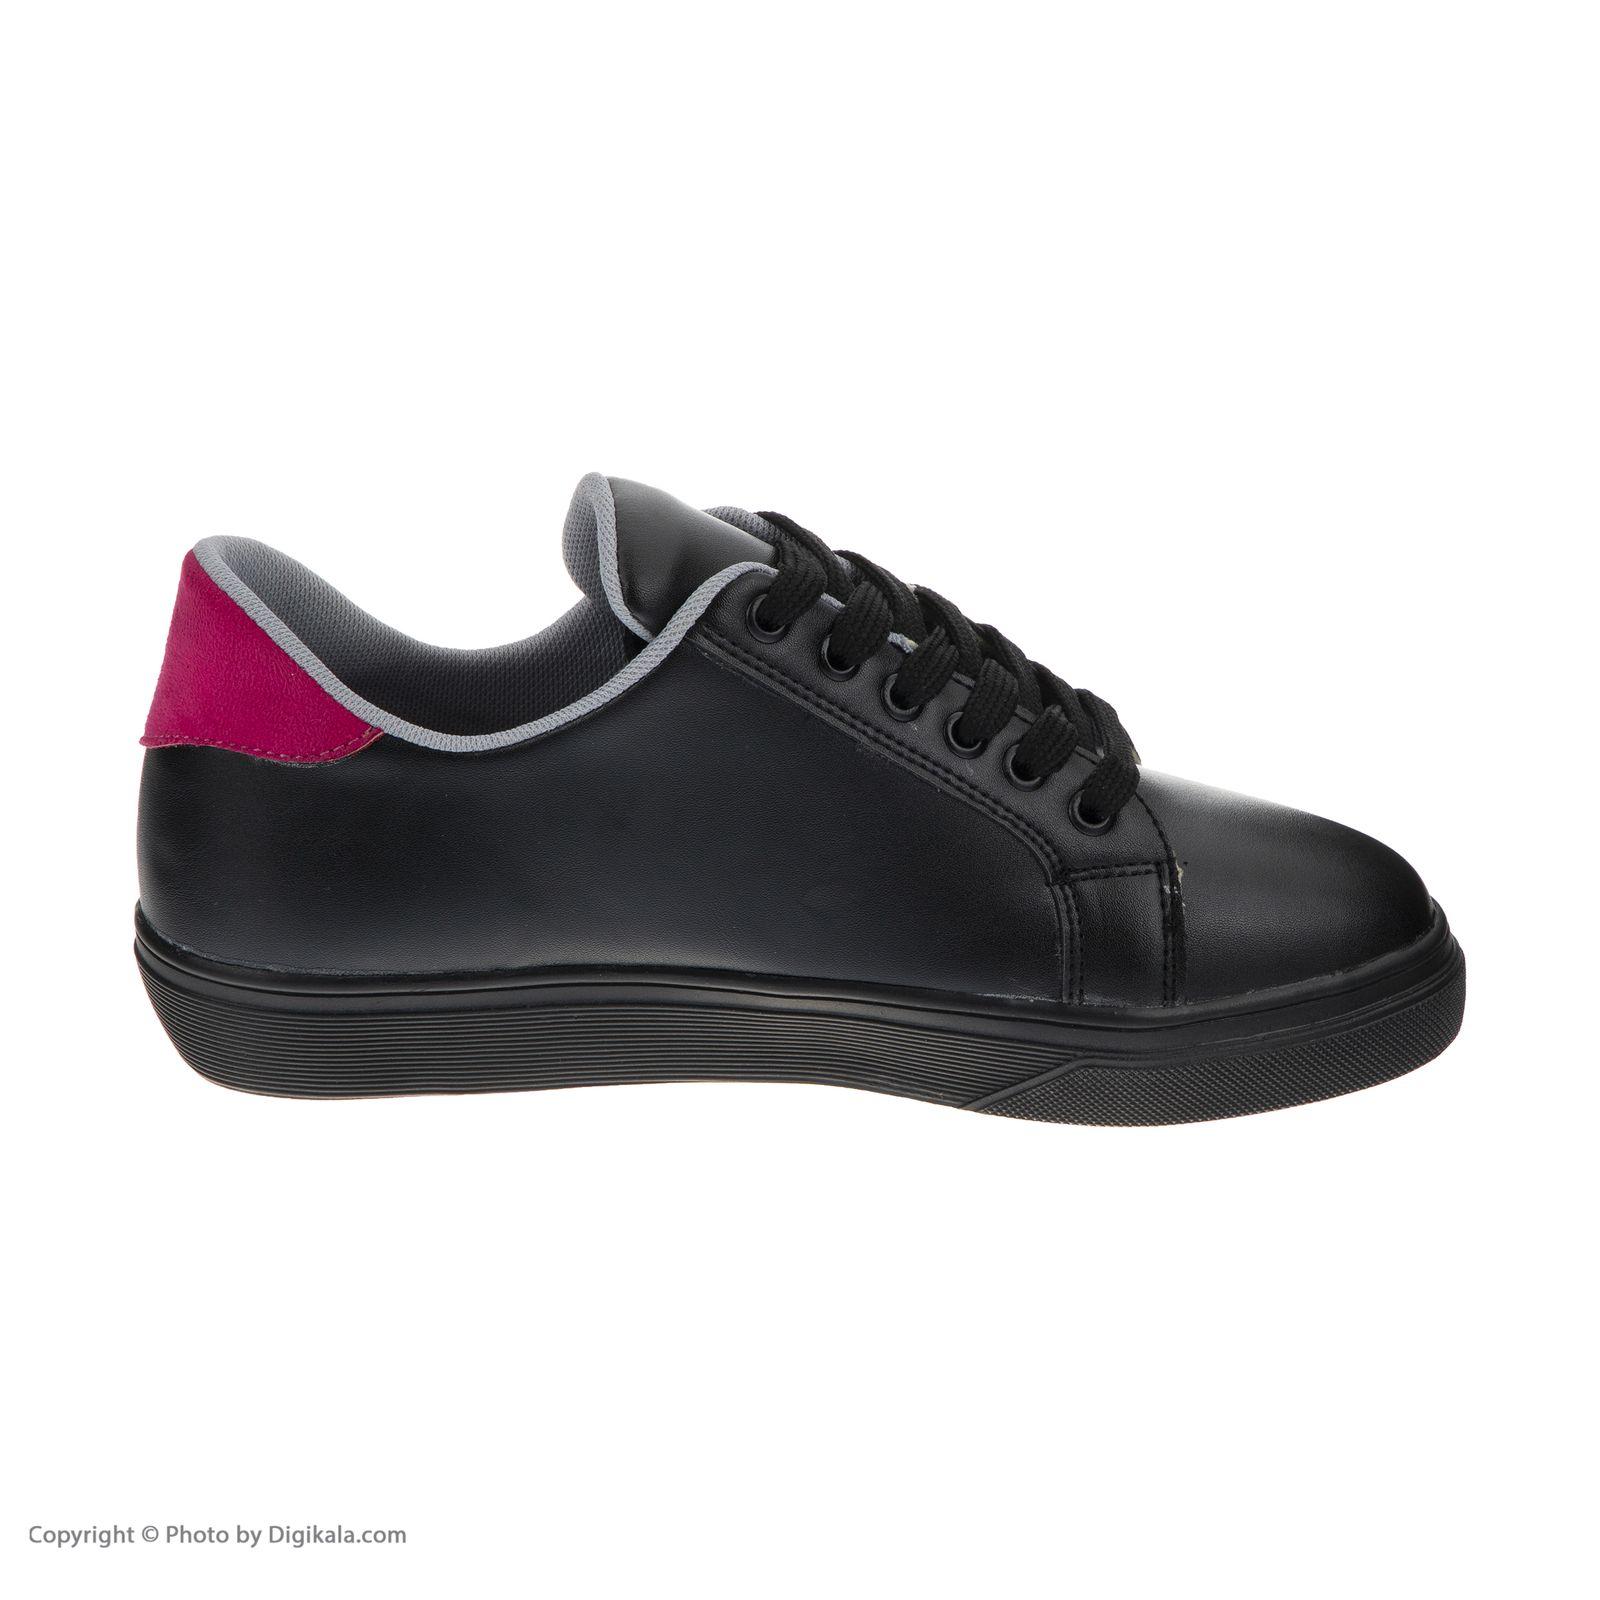 کفش روزمره زنانه مدل 4023 -  - 5